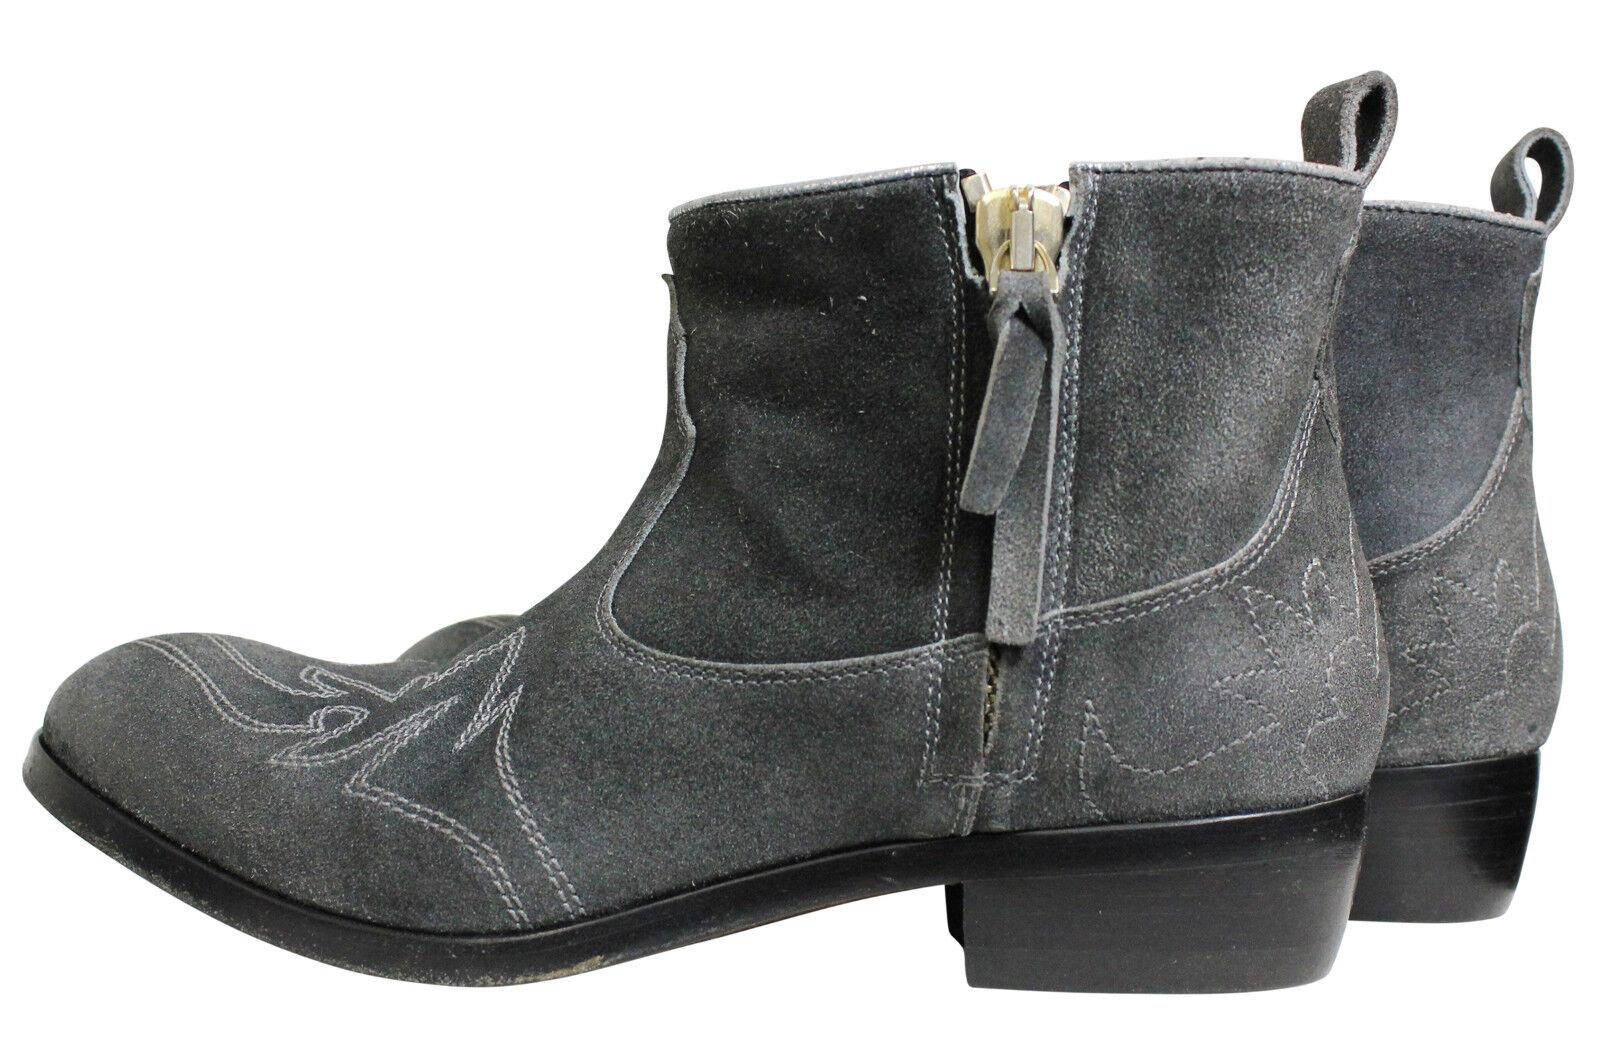 Golden Goose Women Boots Stiefeletten Zanja Grey Silver Grau GR. 36 NEU * 56936